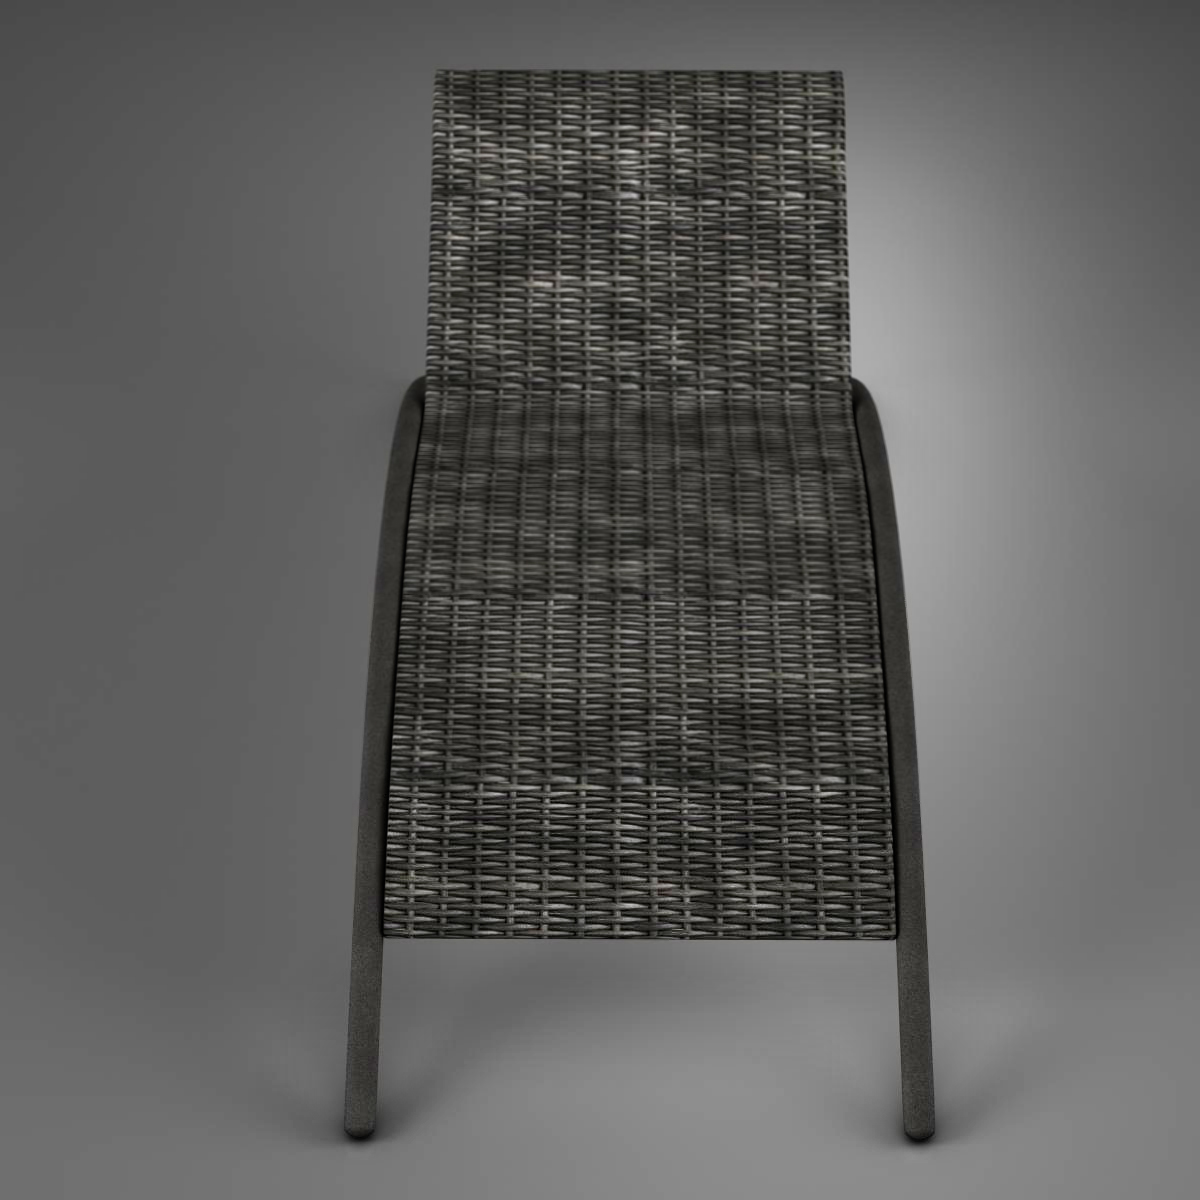 sunbed chair 3d model 3ds max fbx c4d ma mb obj 162640